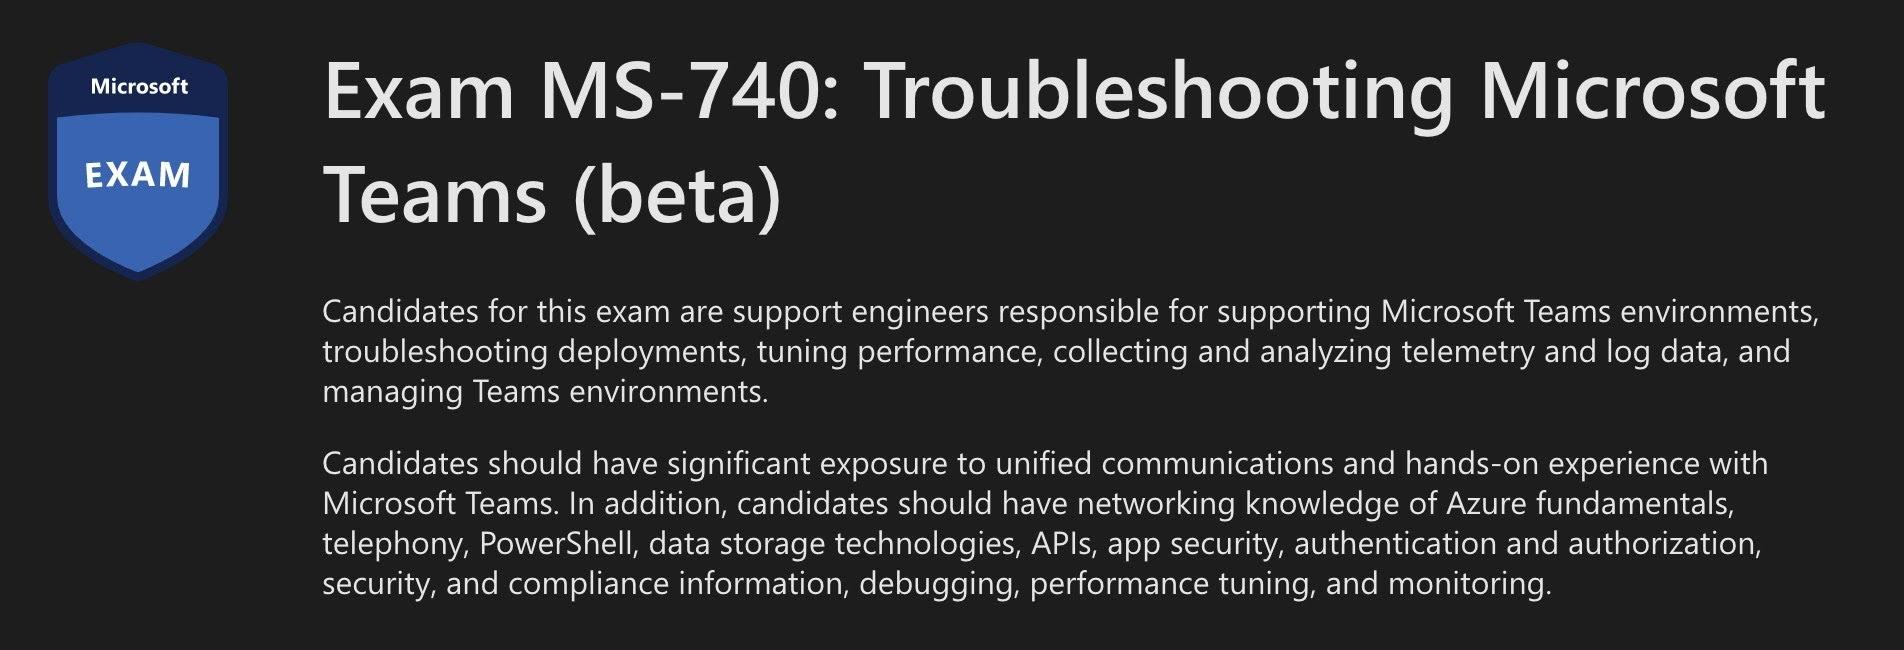 Exam MS-740: Troubleshooting Microsoft Teams (beta)